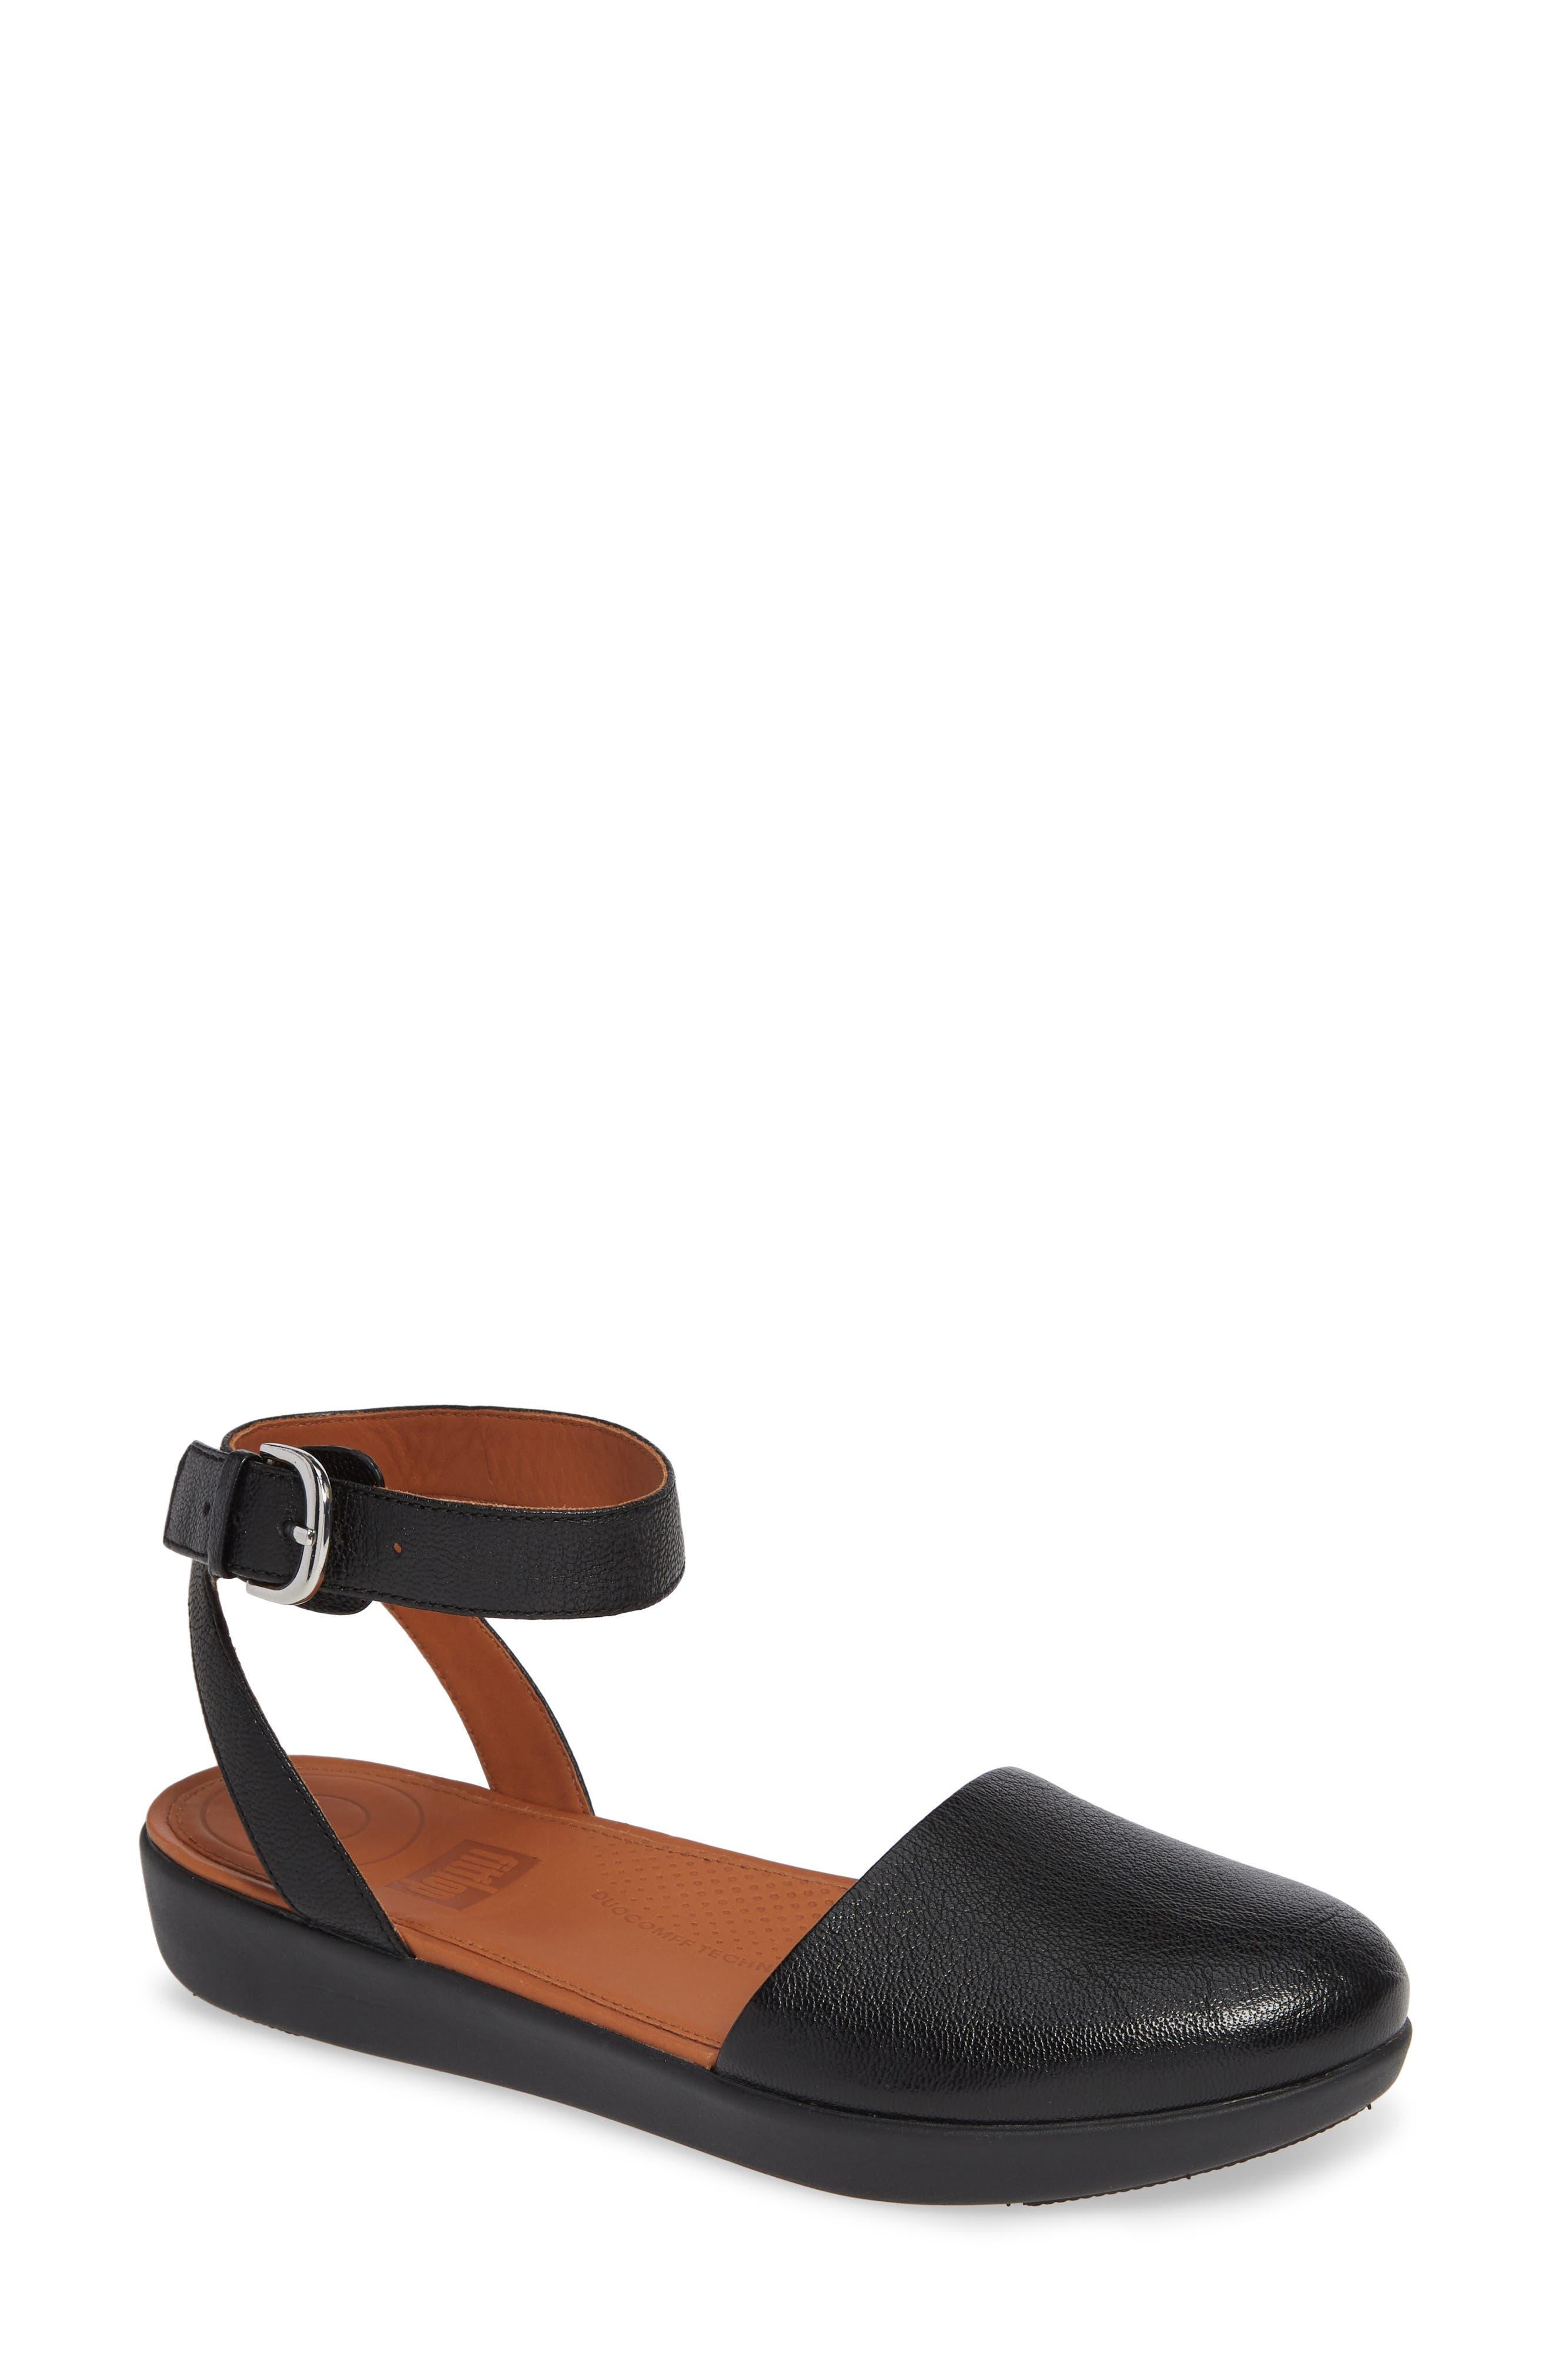 Cova Ankle Strap Sandal,                             Main thumbnail 1, color,                             BLACK LEATHER